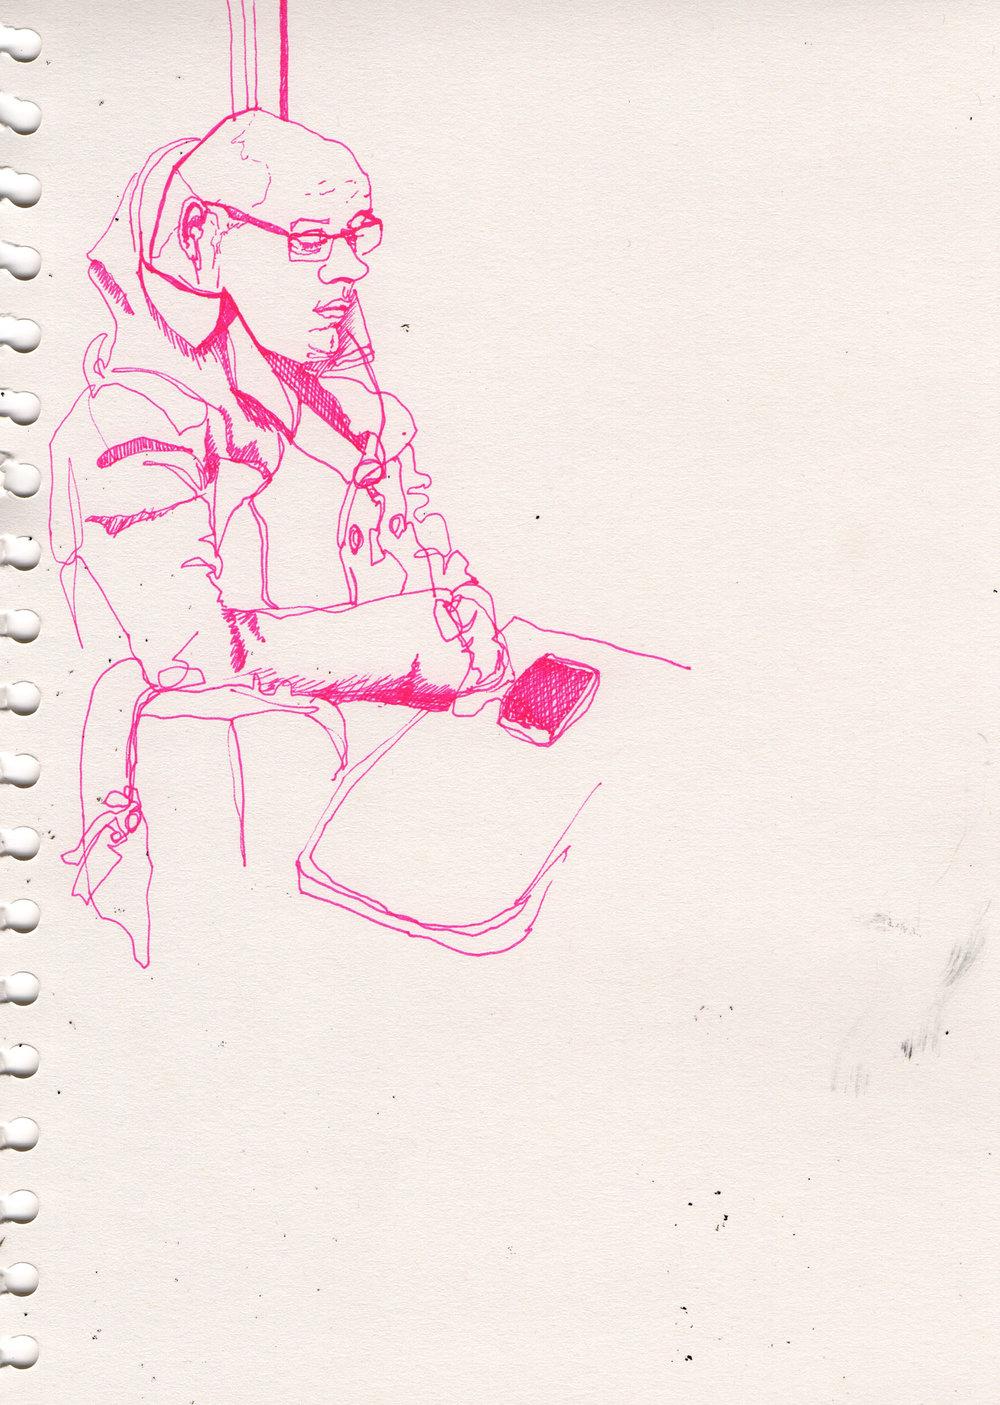 Whiten_bald man_drawing_illustration.jpeg